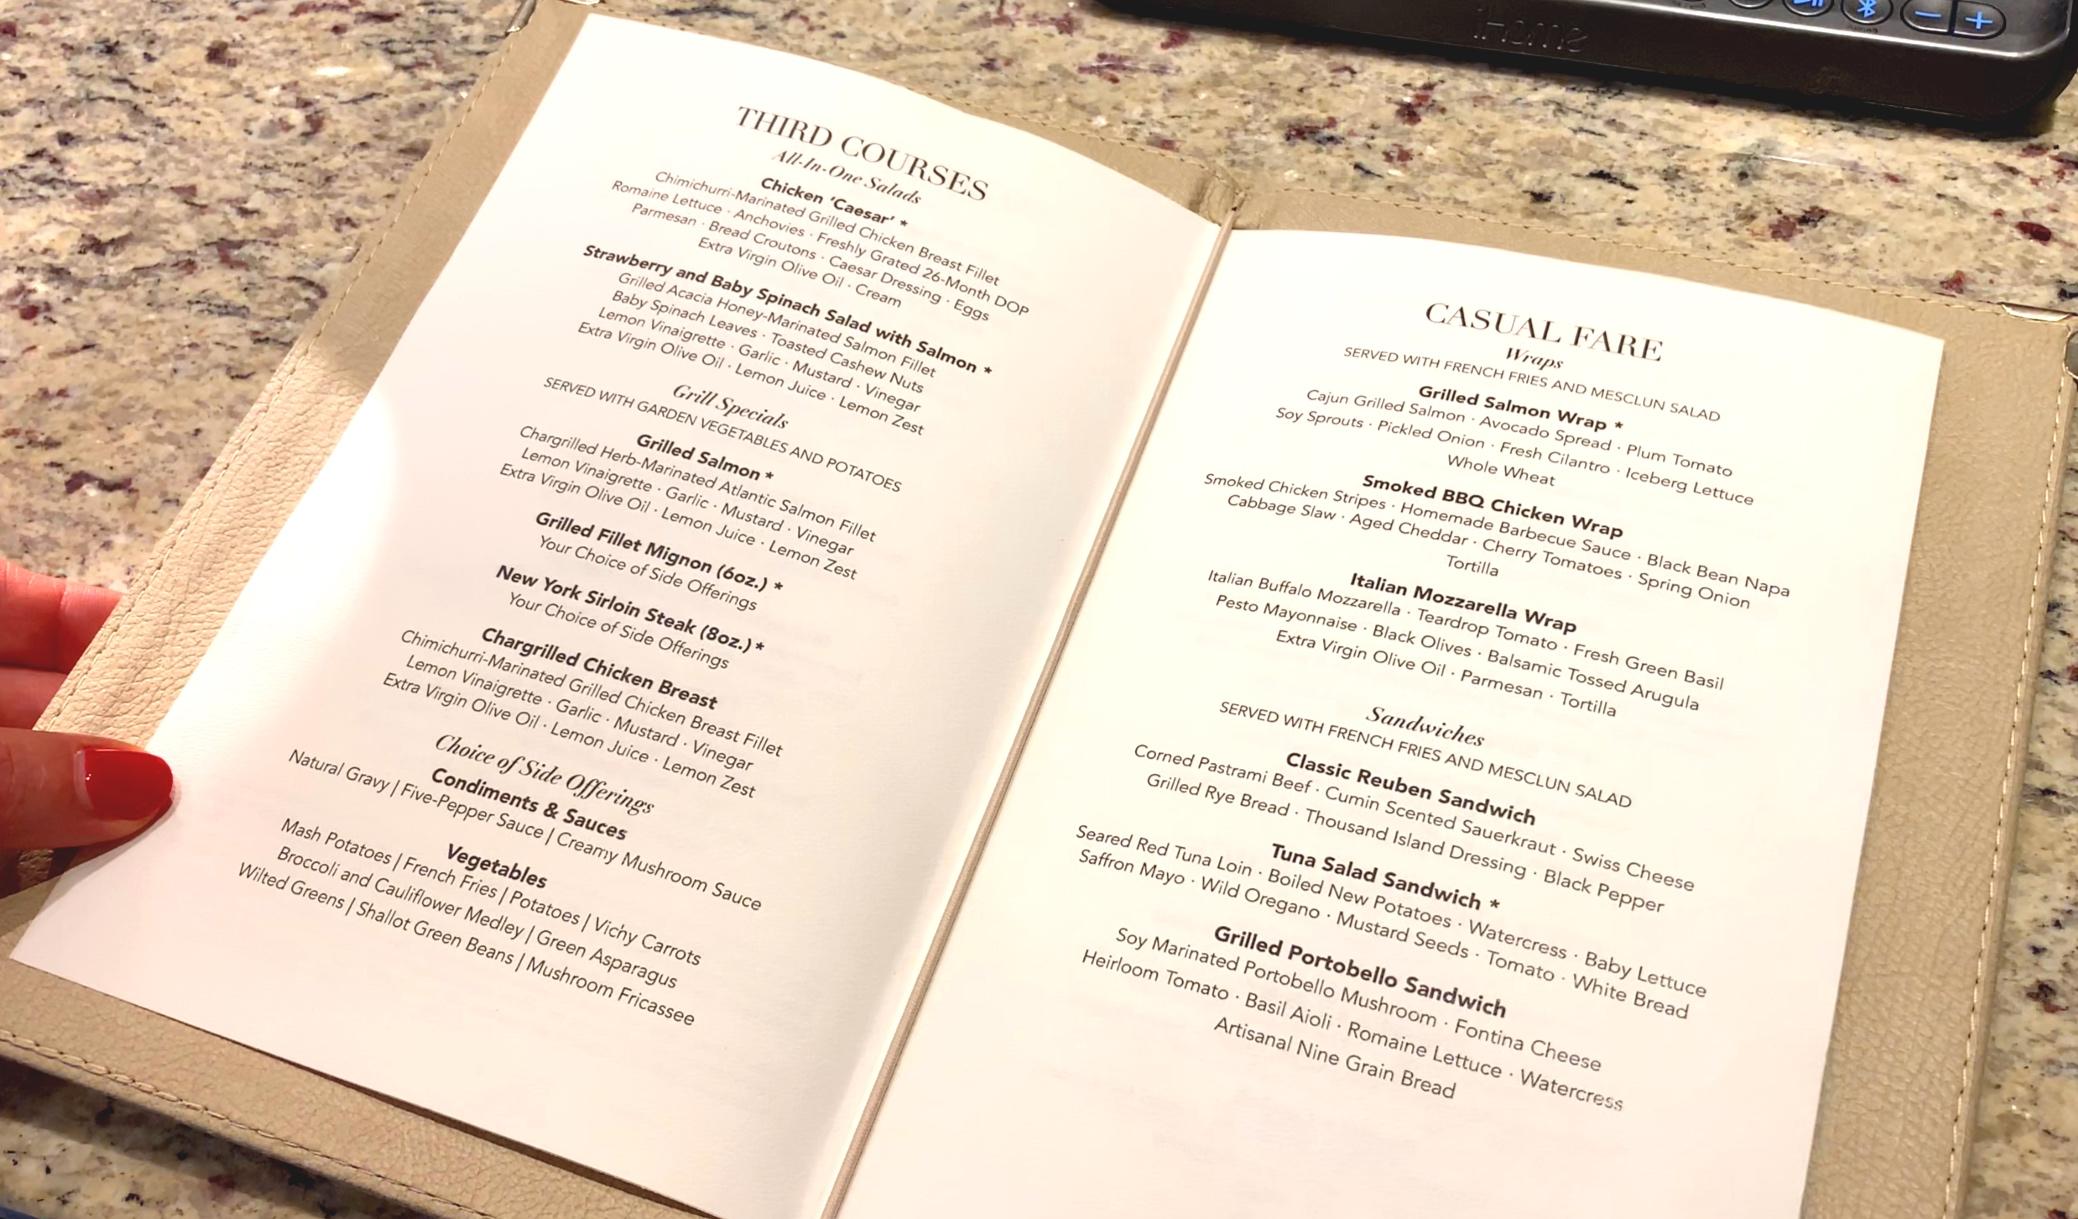 Room service menu.